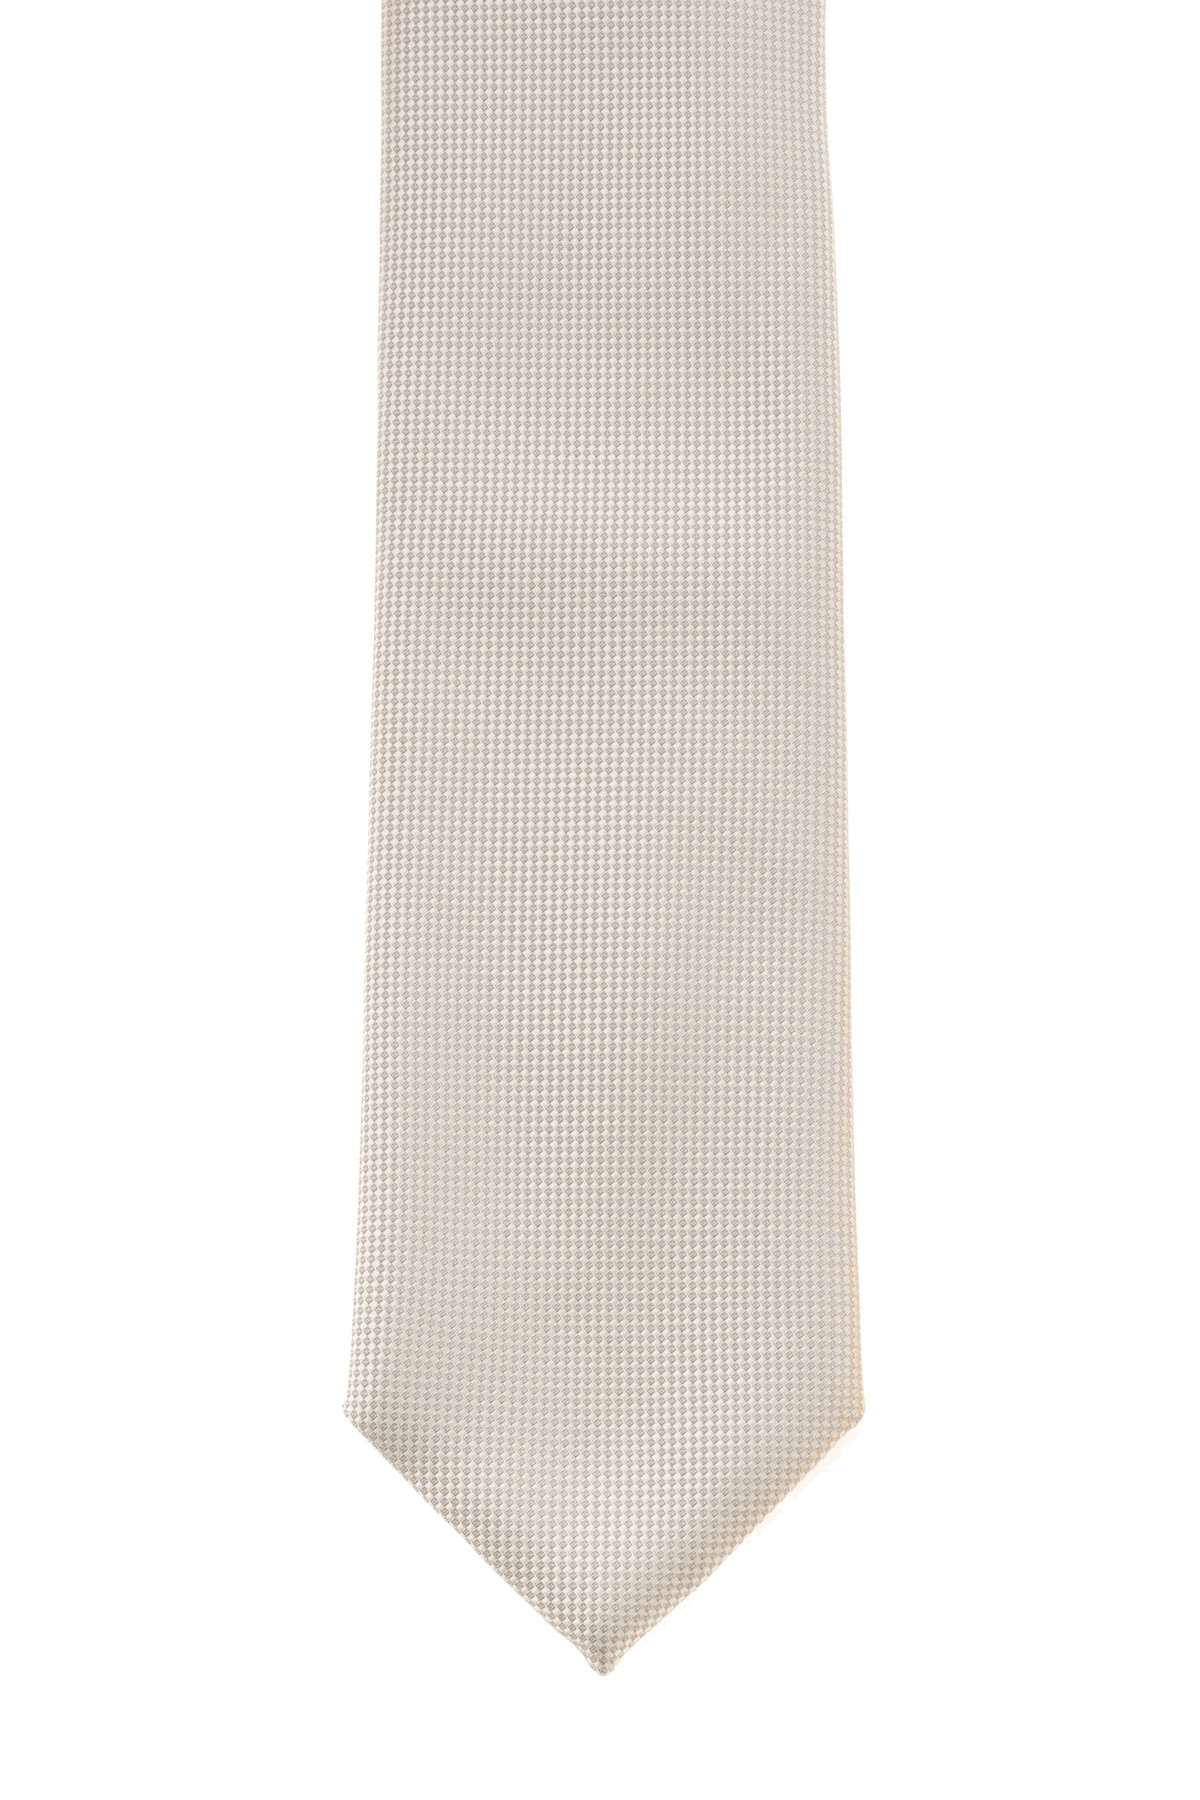 RIONE FONTANA   Beige tie for men